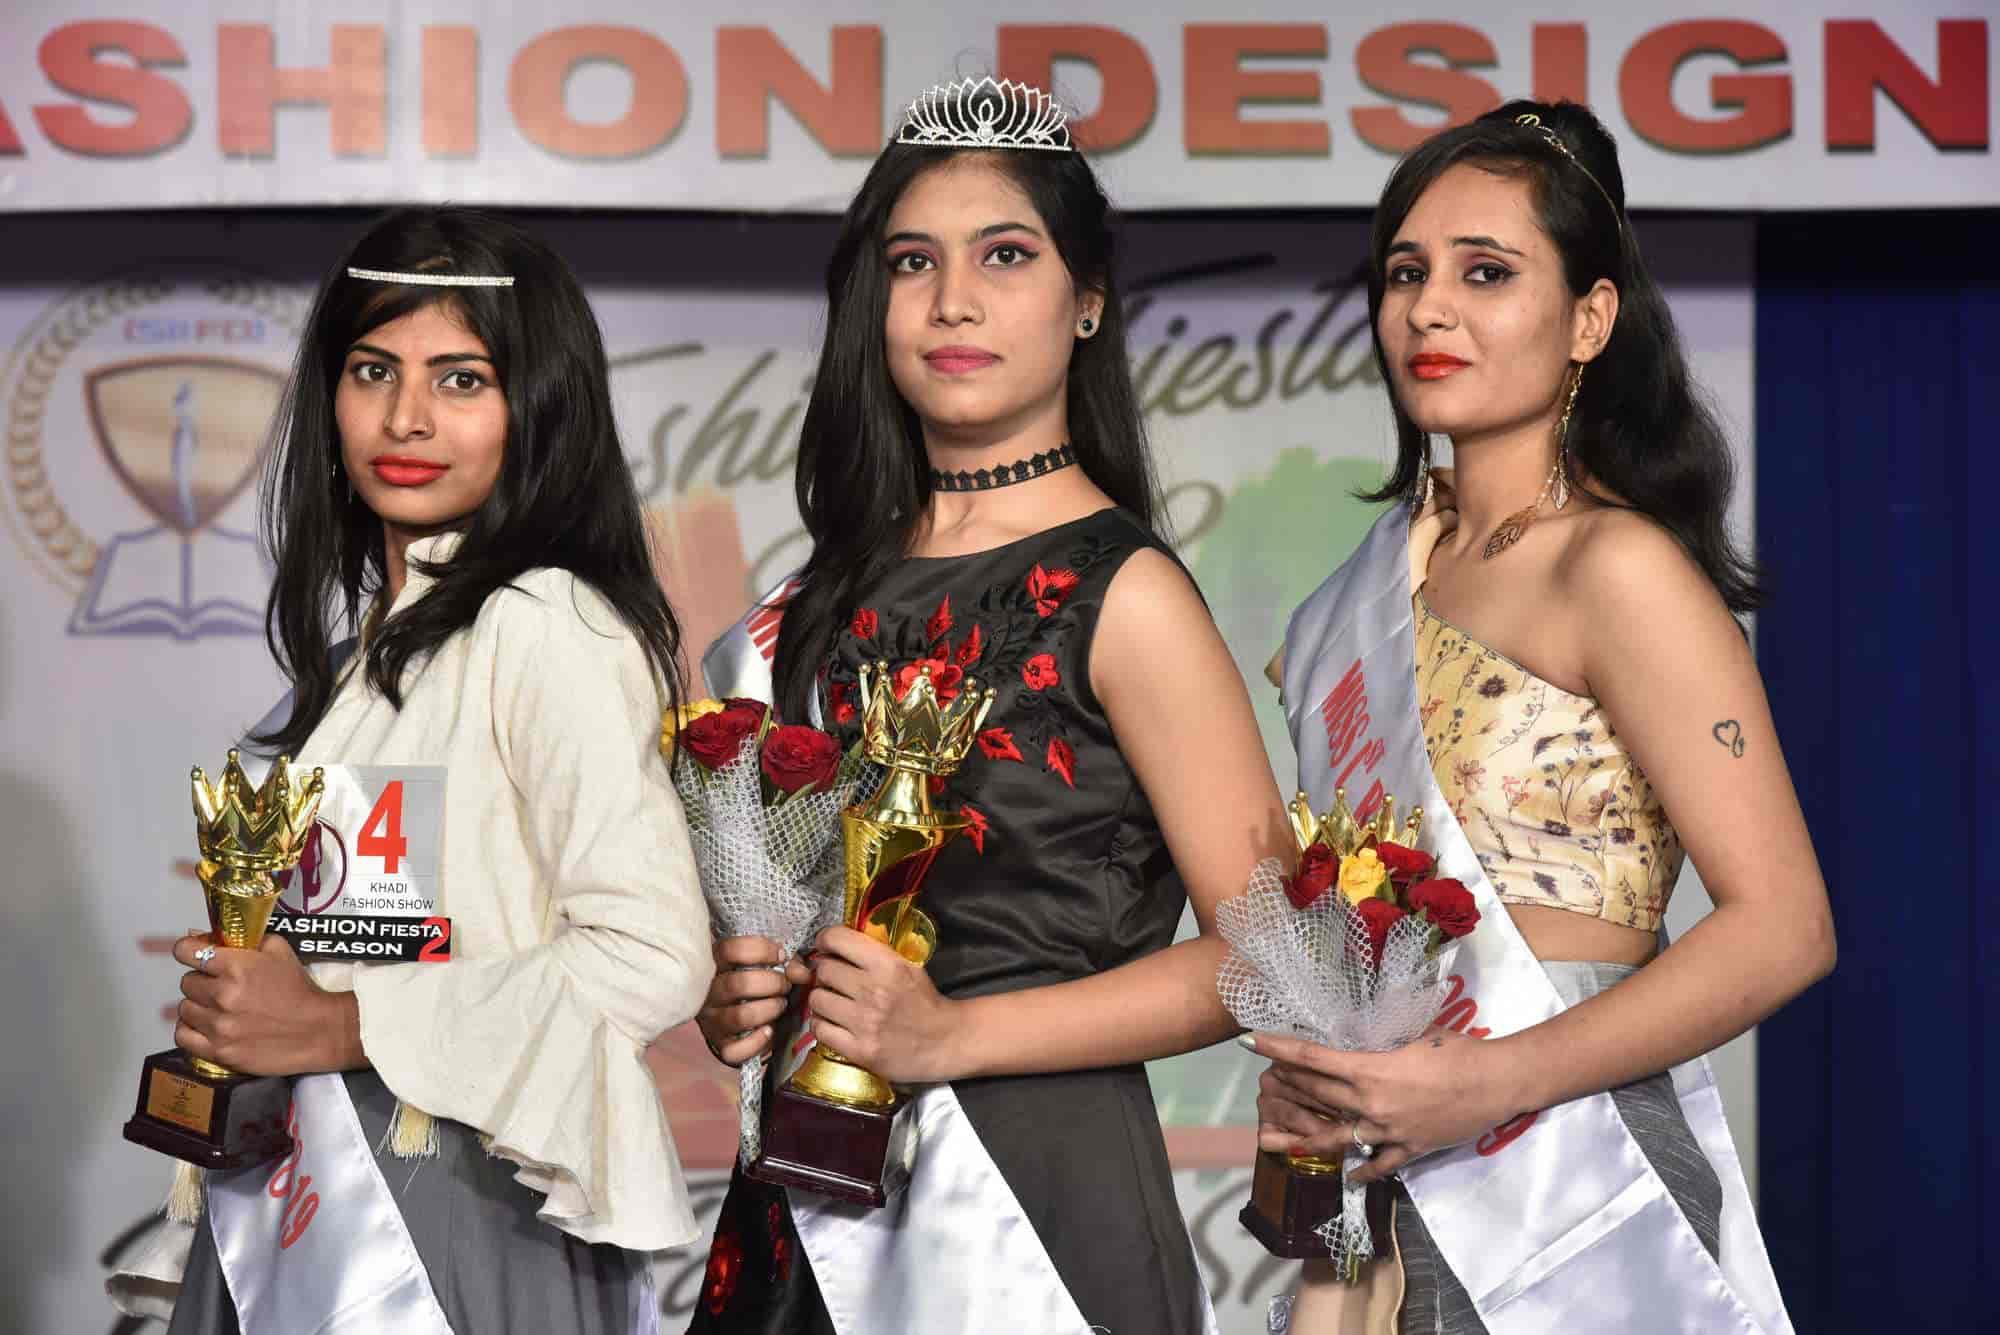 Skylink International Institute Of Fashion Designing Mansarovar Fashion Designing Institutes In Jaipur Justdial